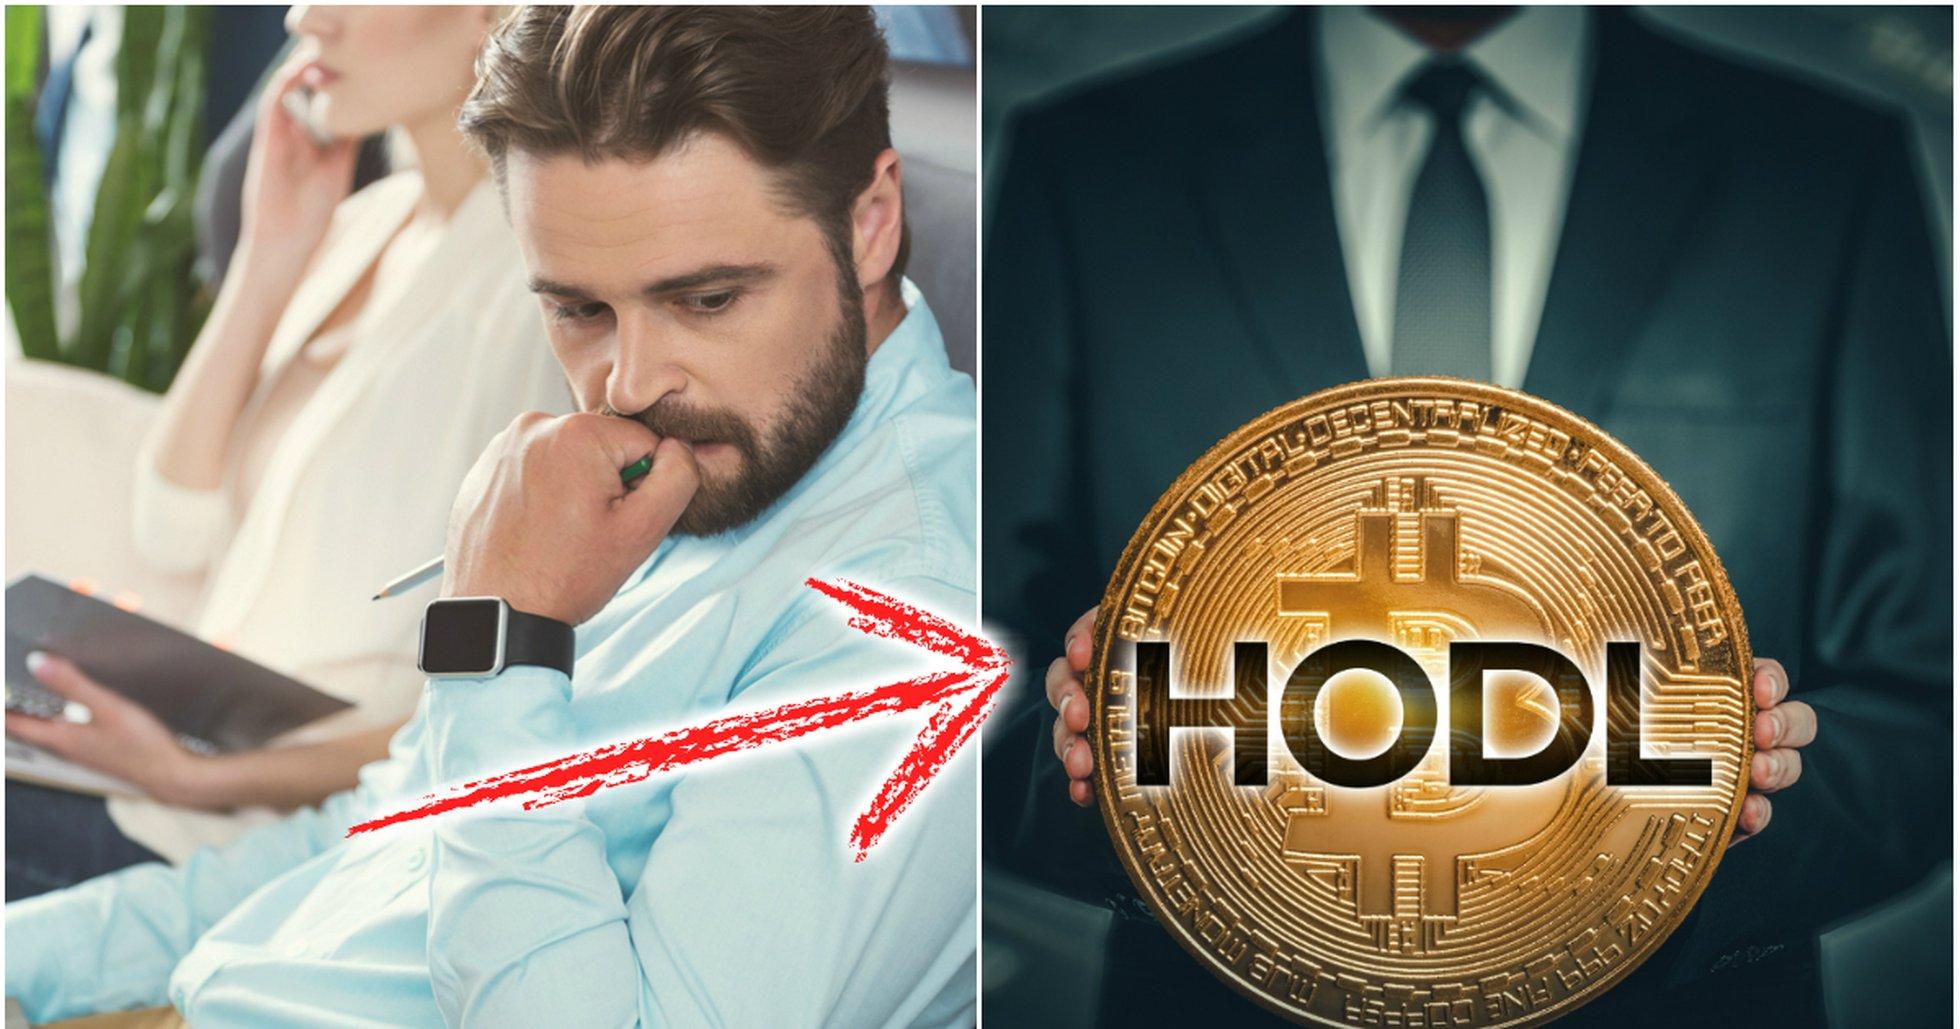 Ny studie: Investerare håller hårt i sina bitcoin.